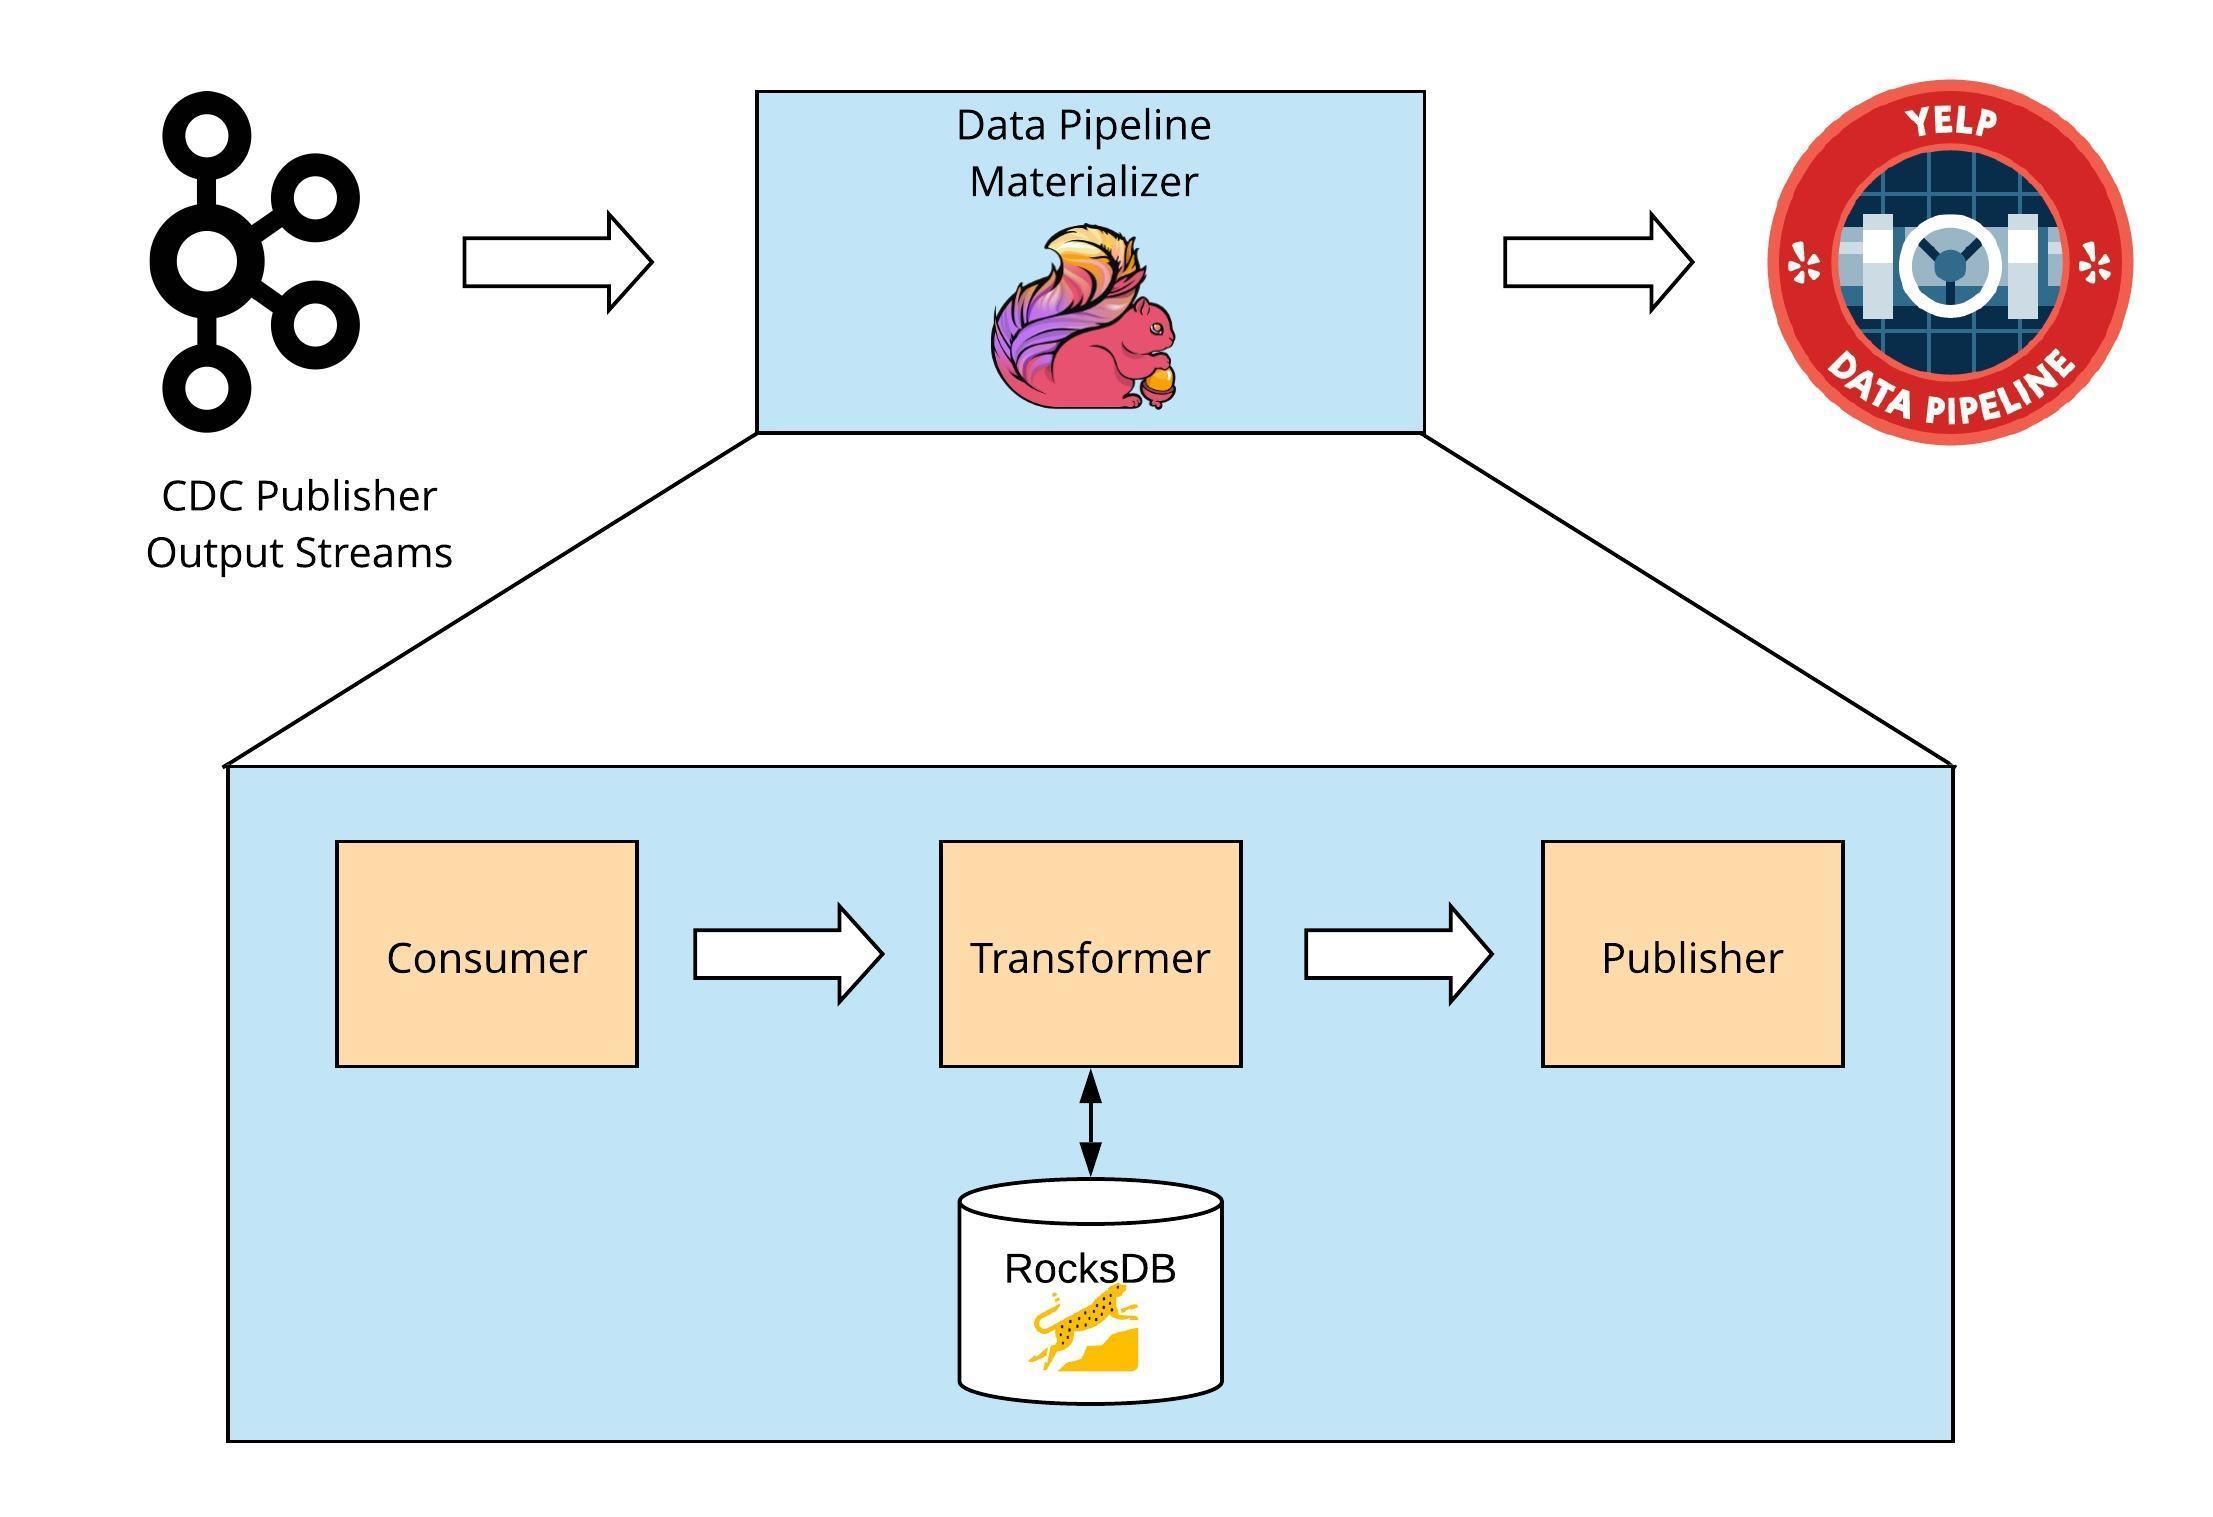 Data Pipeline Materializer